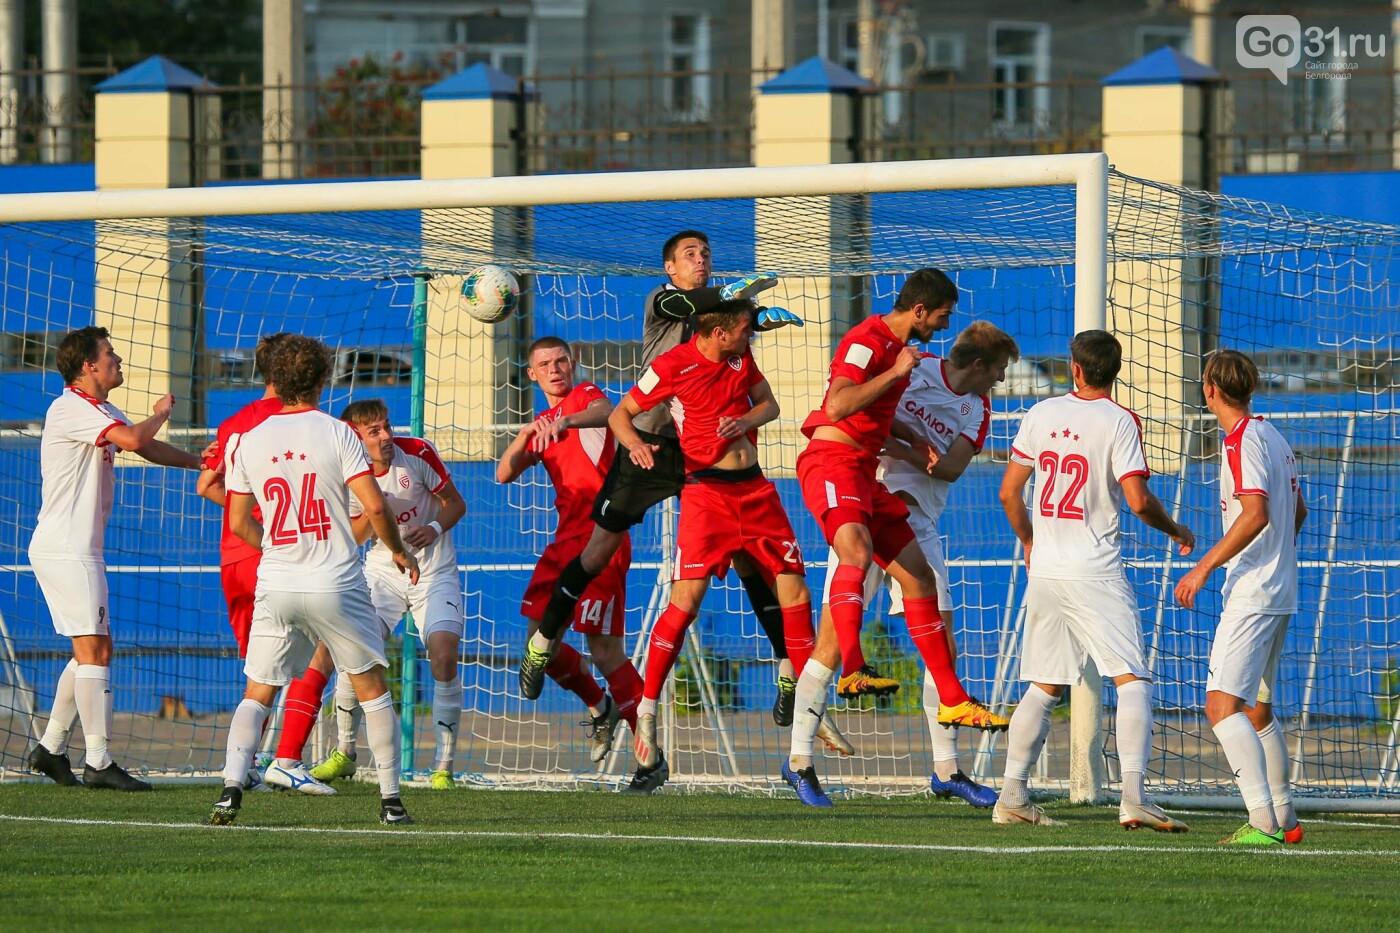 «Салют Белгород»: третья победа подряд, фото-17, Фото: Антон Вергун